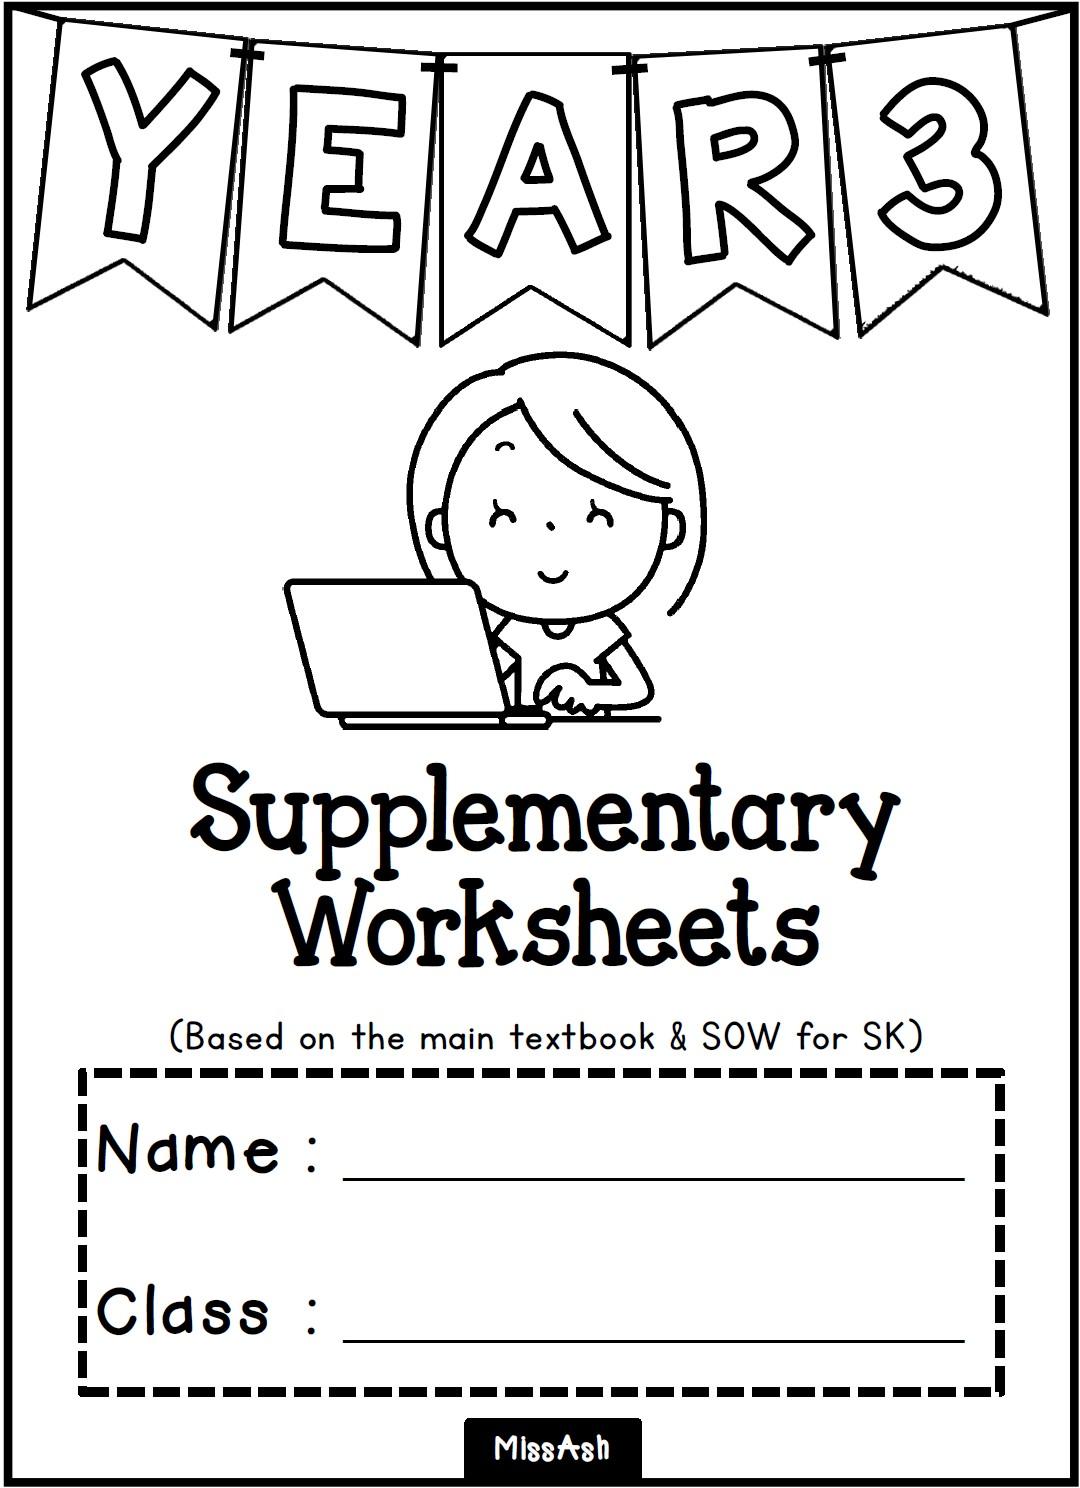 Ash The Teacher Year 3 Supplementary Worksheets